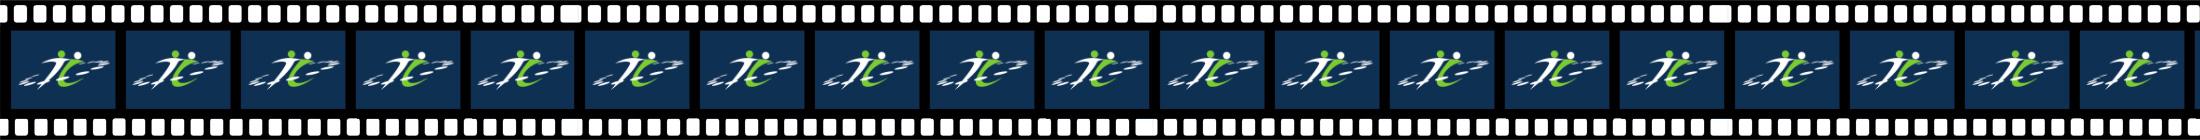 Escola de Coaching ECIT | Life Coaching | Coaching Educacional | Desenvolvimento Pessoal | Inteligência Emocional - Canal Youtube da Escola de Coaching ECIT